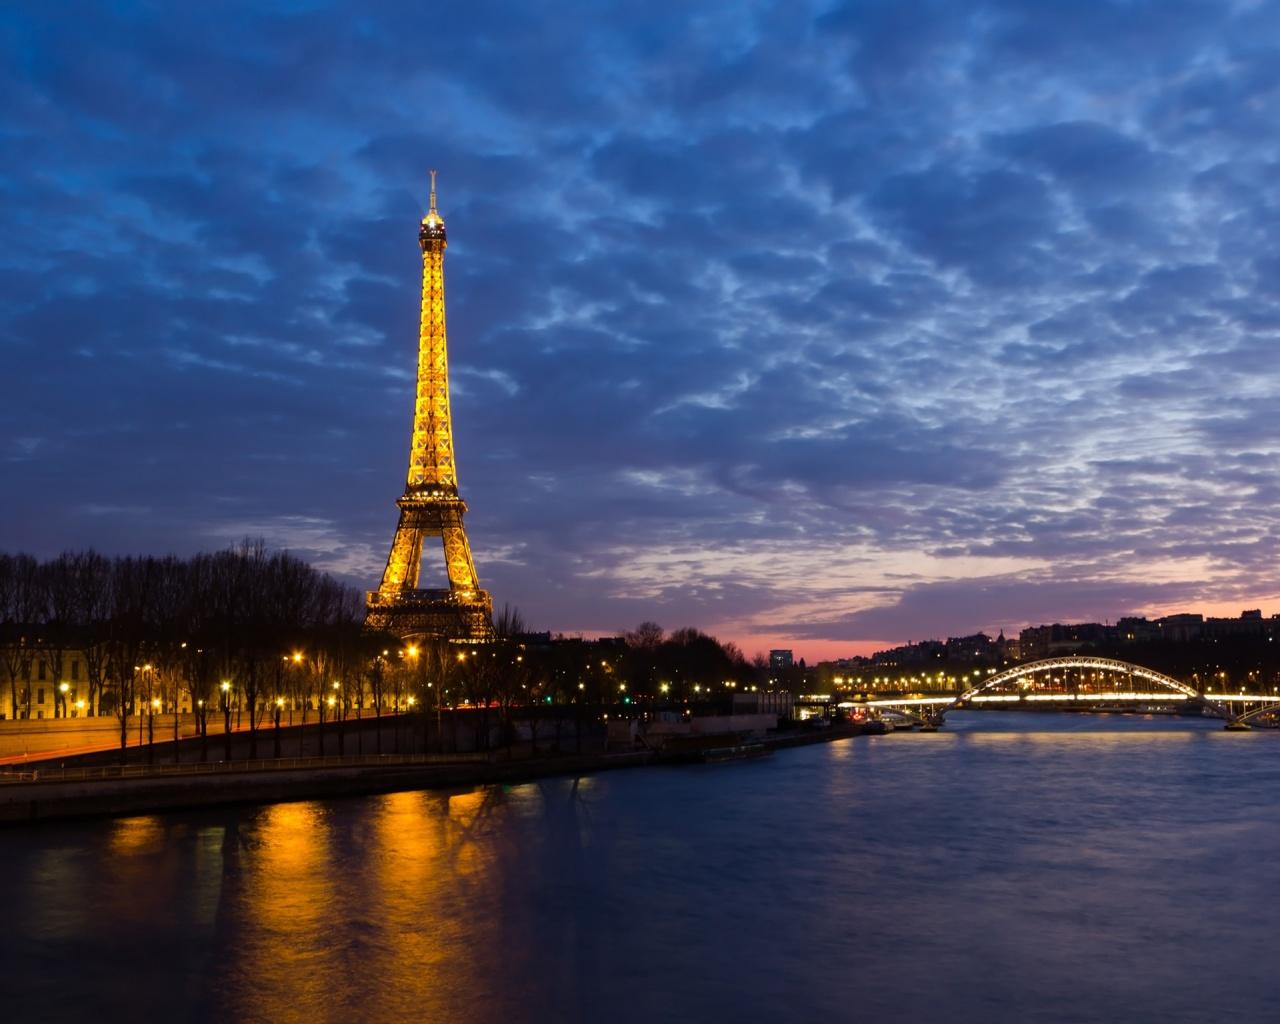 Fondo De Pantalla De La Torre Eiffel En La Noche